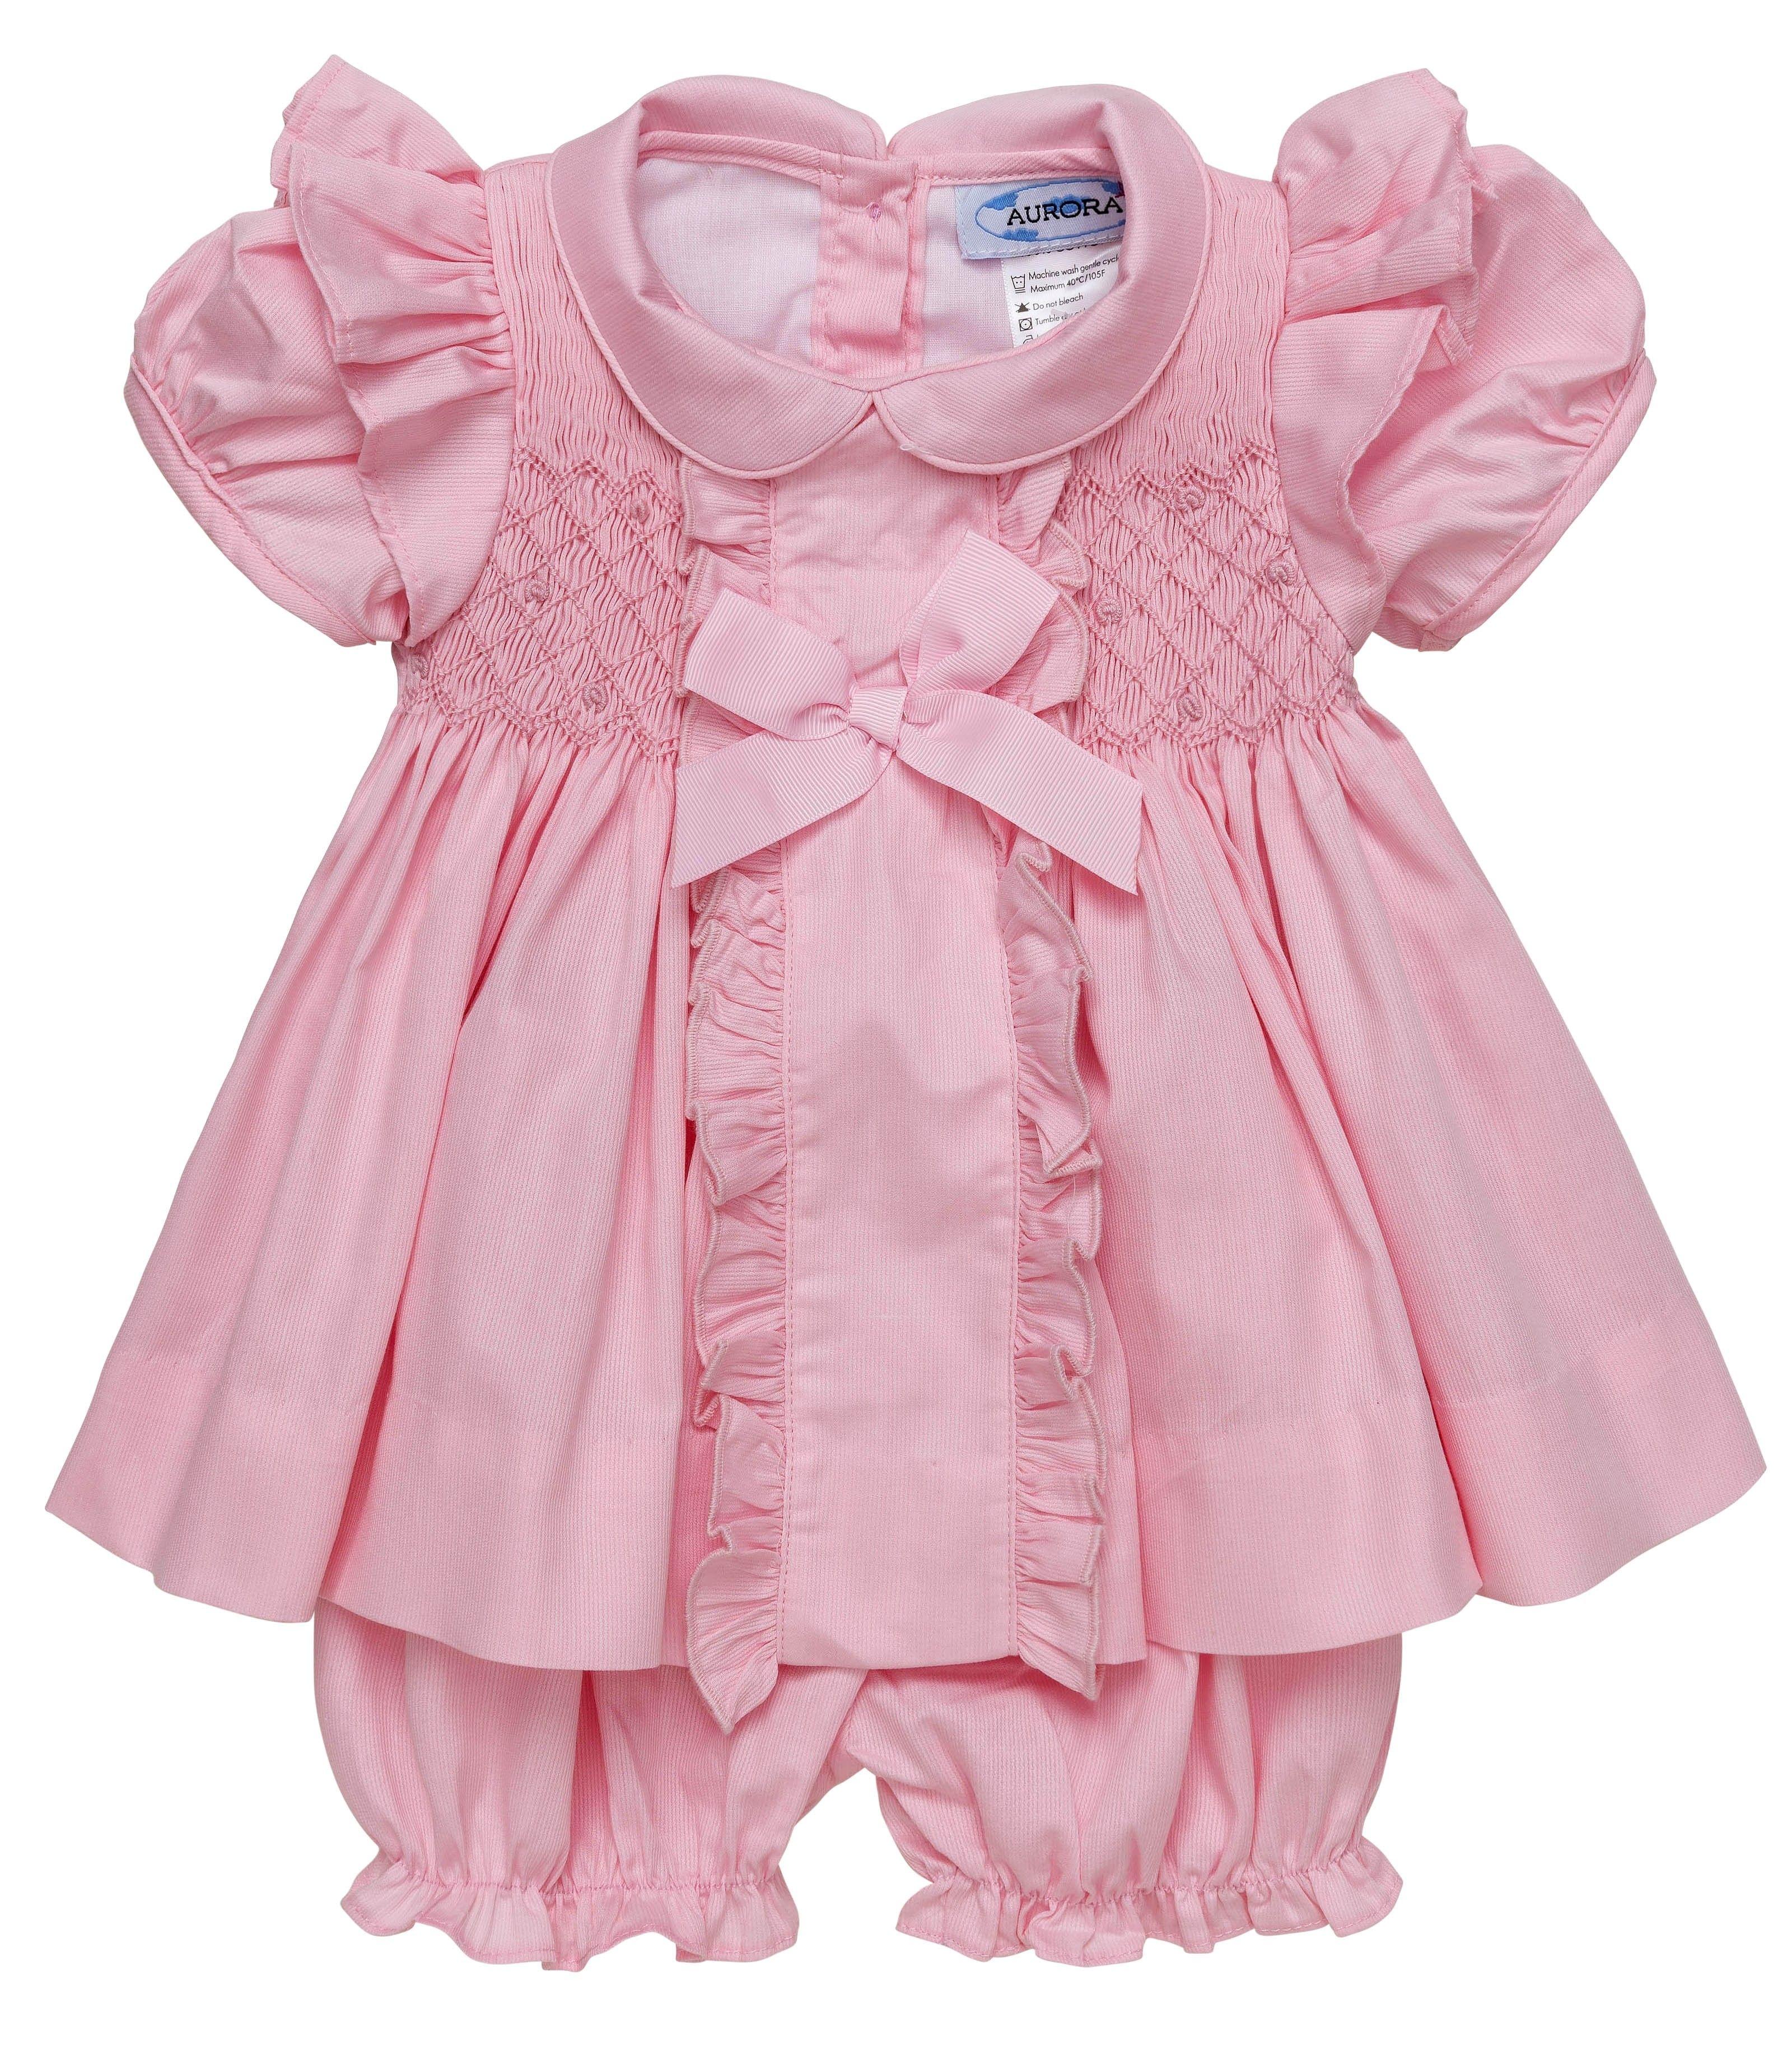 Aurora royal leonora pink handsmocked dress set